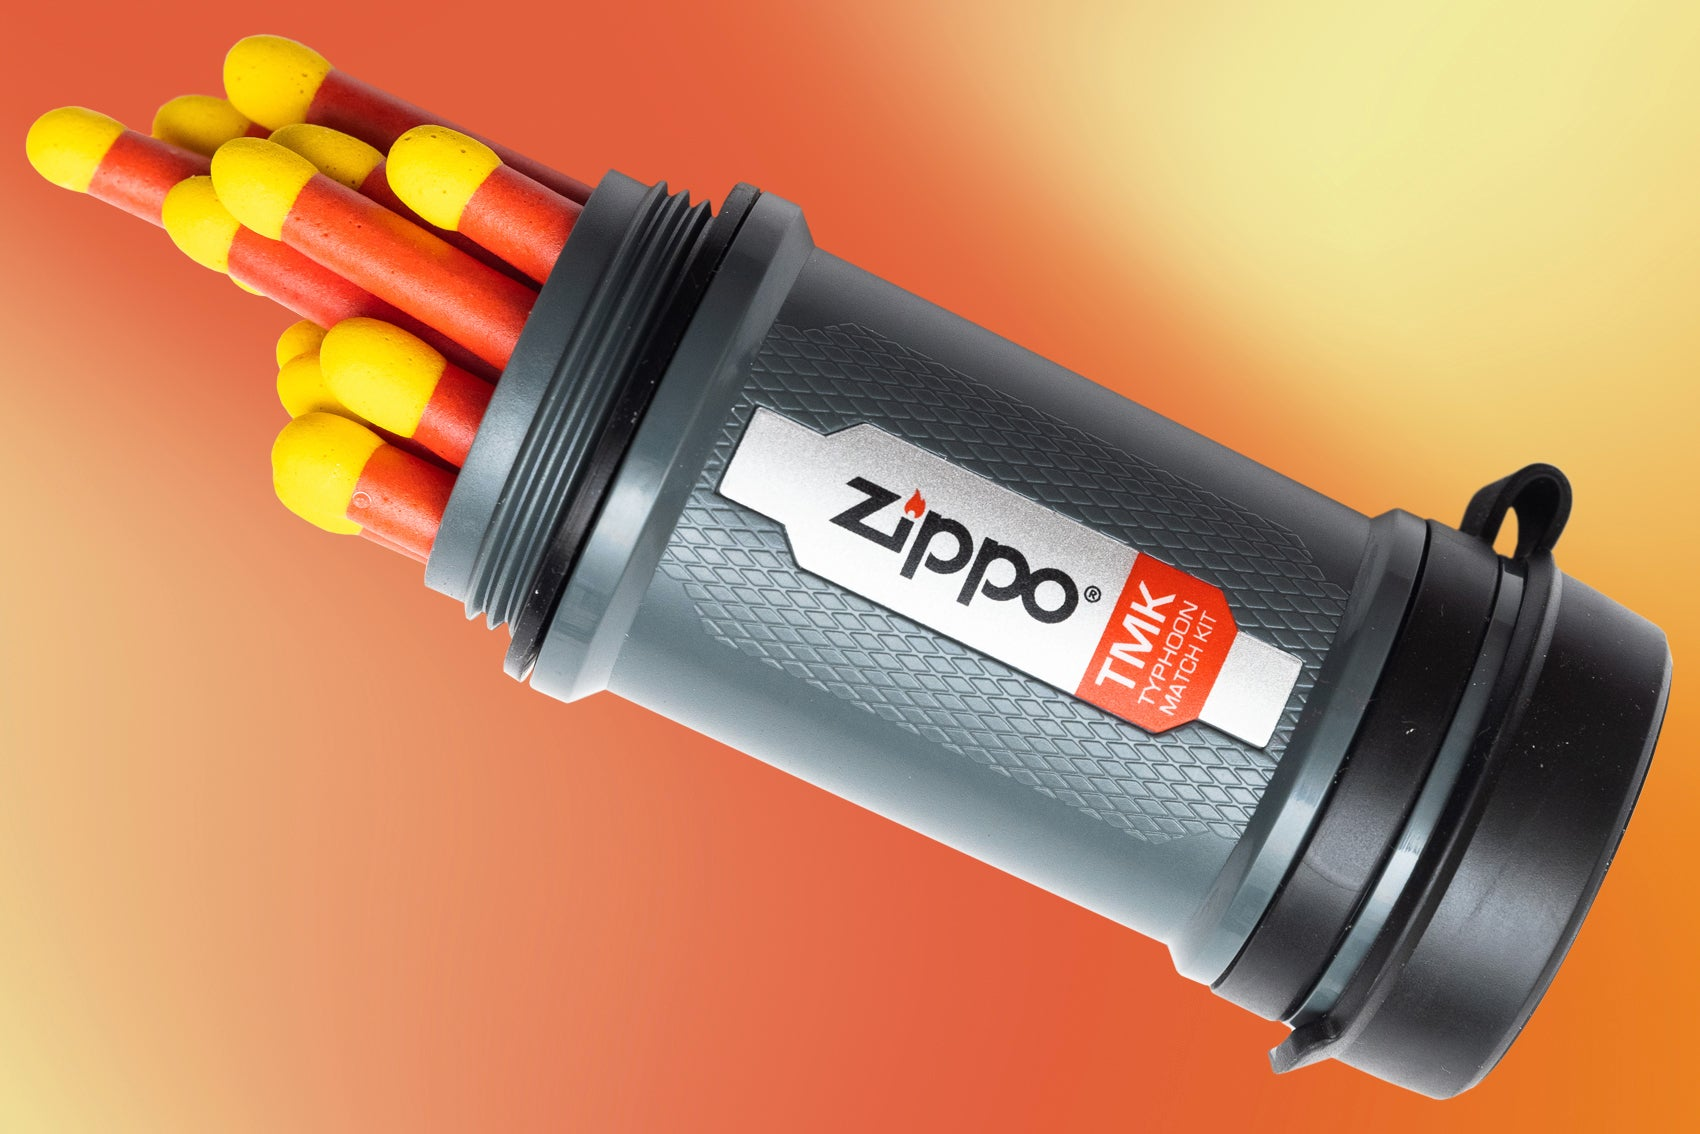 Zippo matches